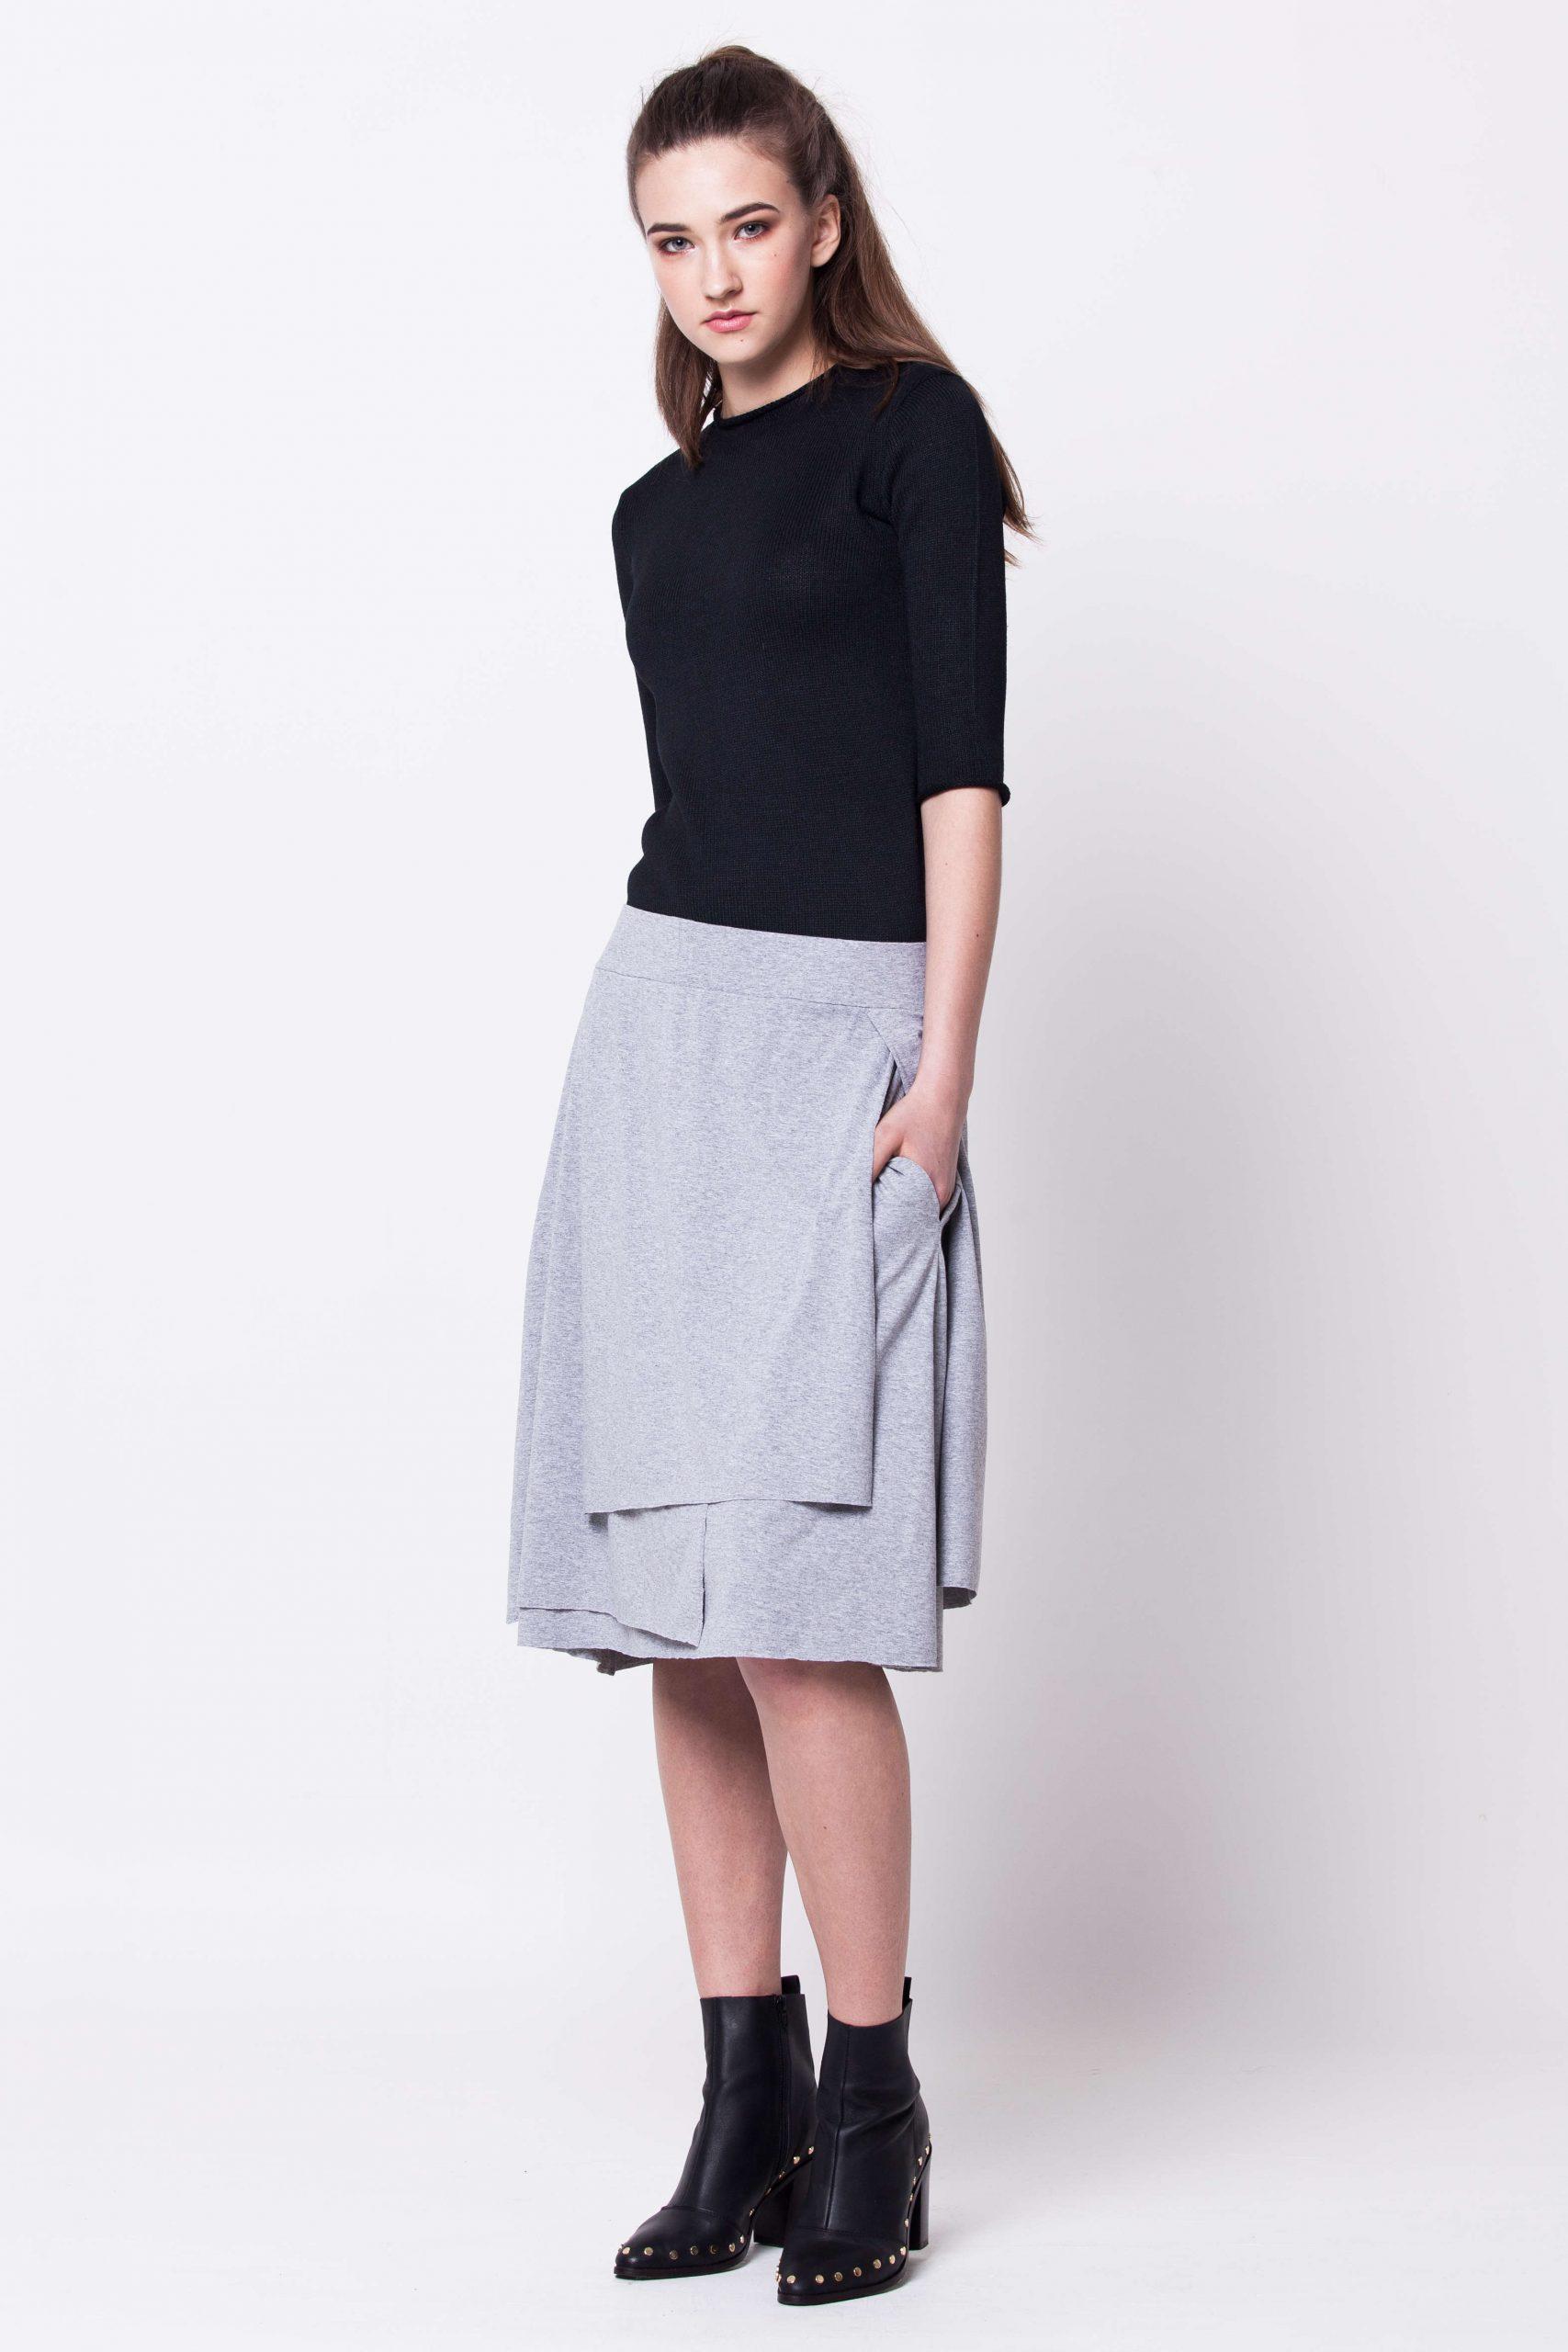 Grey layered jersey womens ladies skirt graue damen rock HANNA GREY